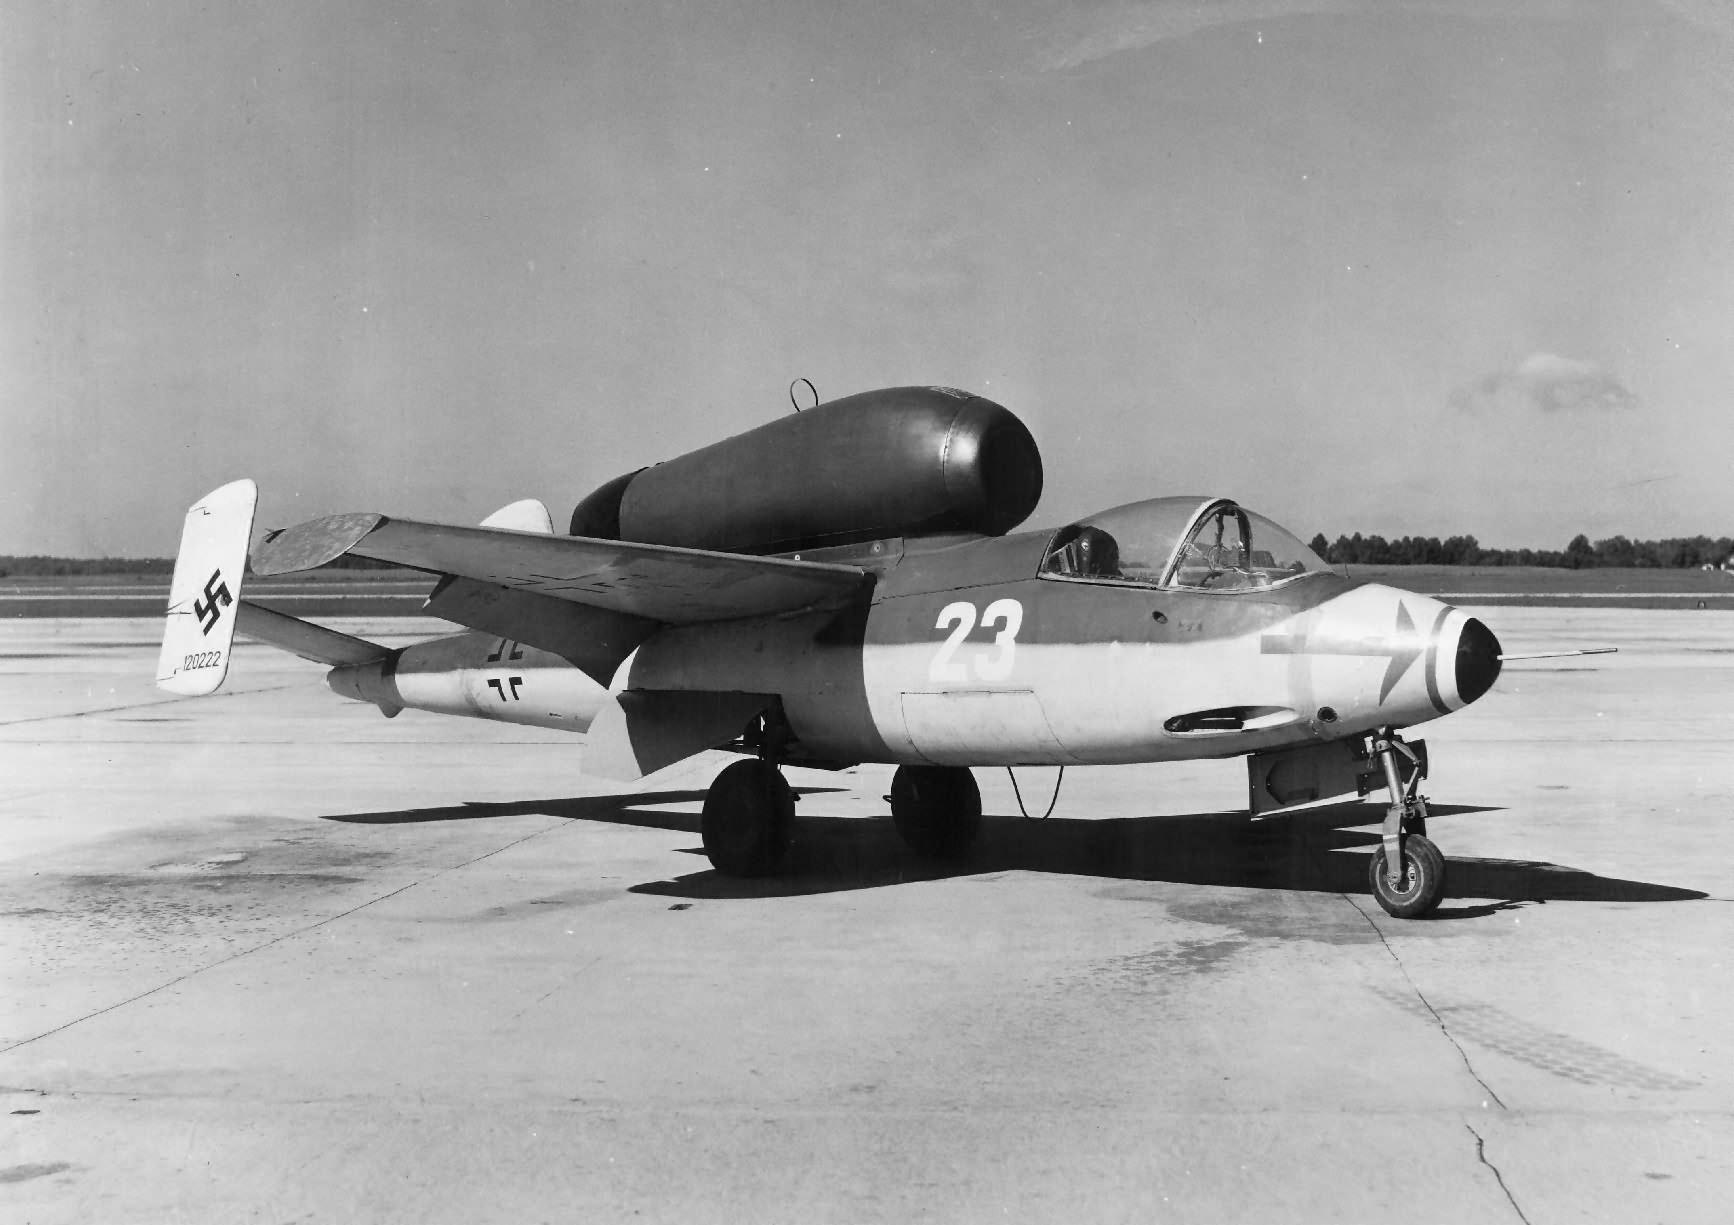 He 162 Volksjäger white 23 120222, USA 1945